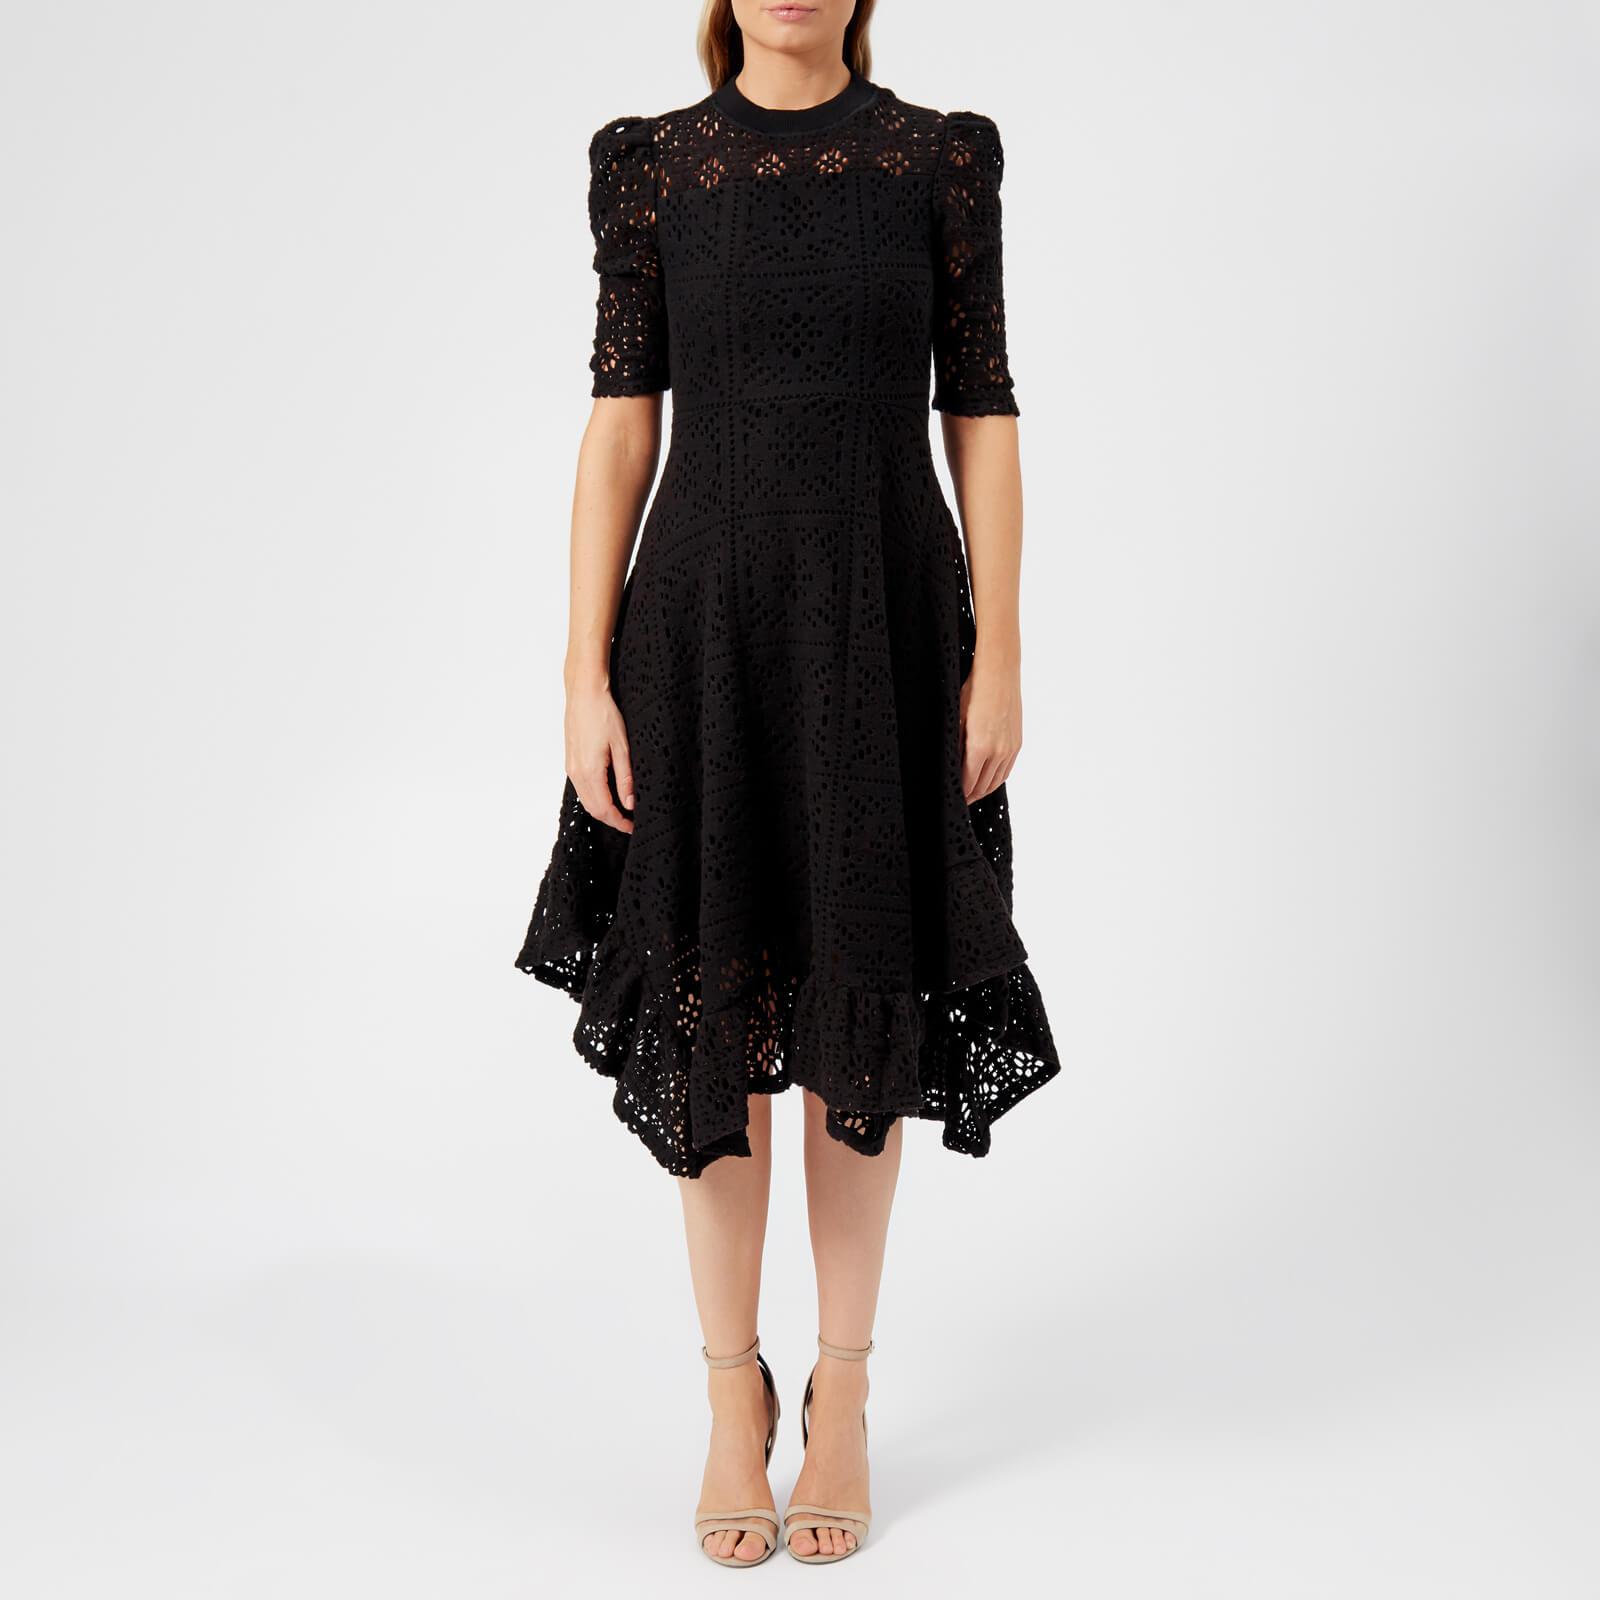 3eca2291b6 See By Chloé Women's Floral Jersey Lace Midi Dress - Black